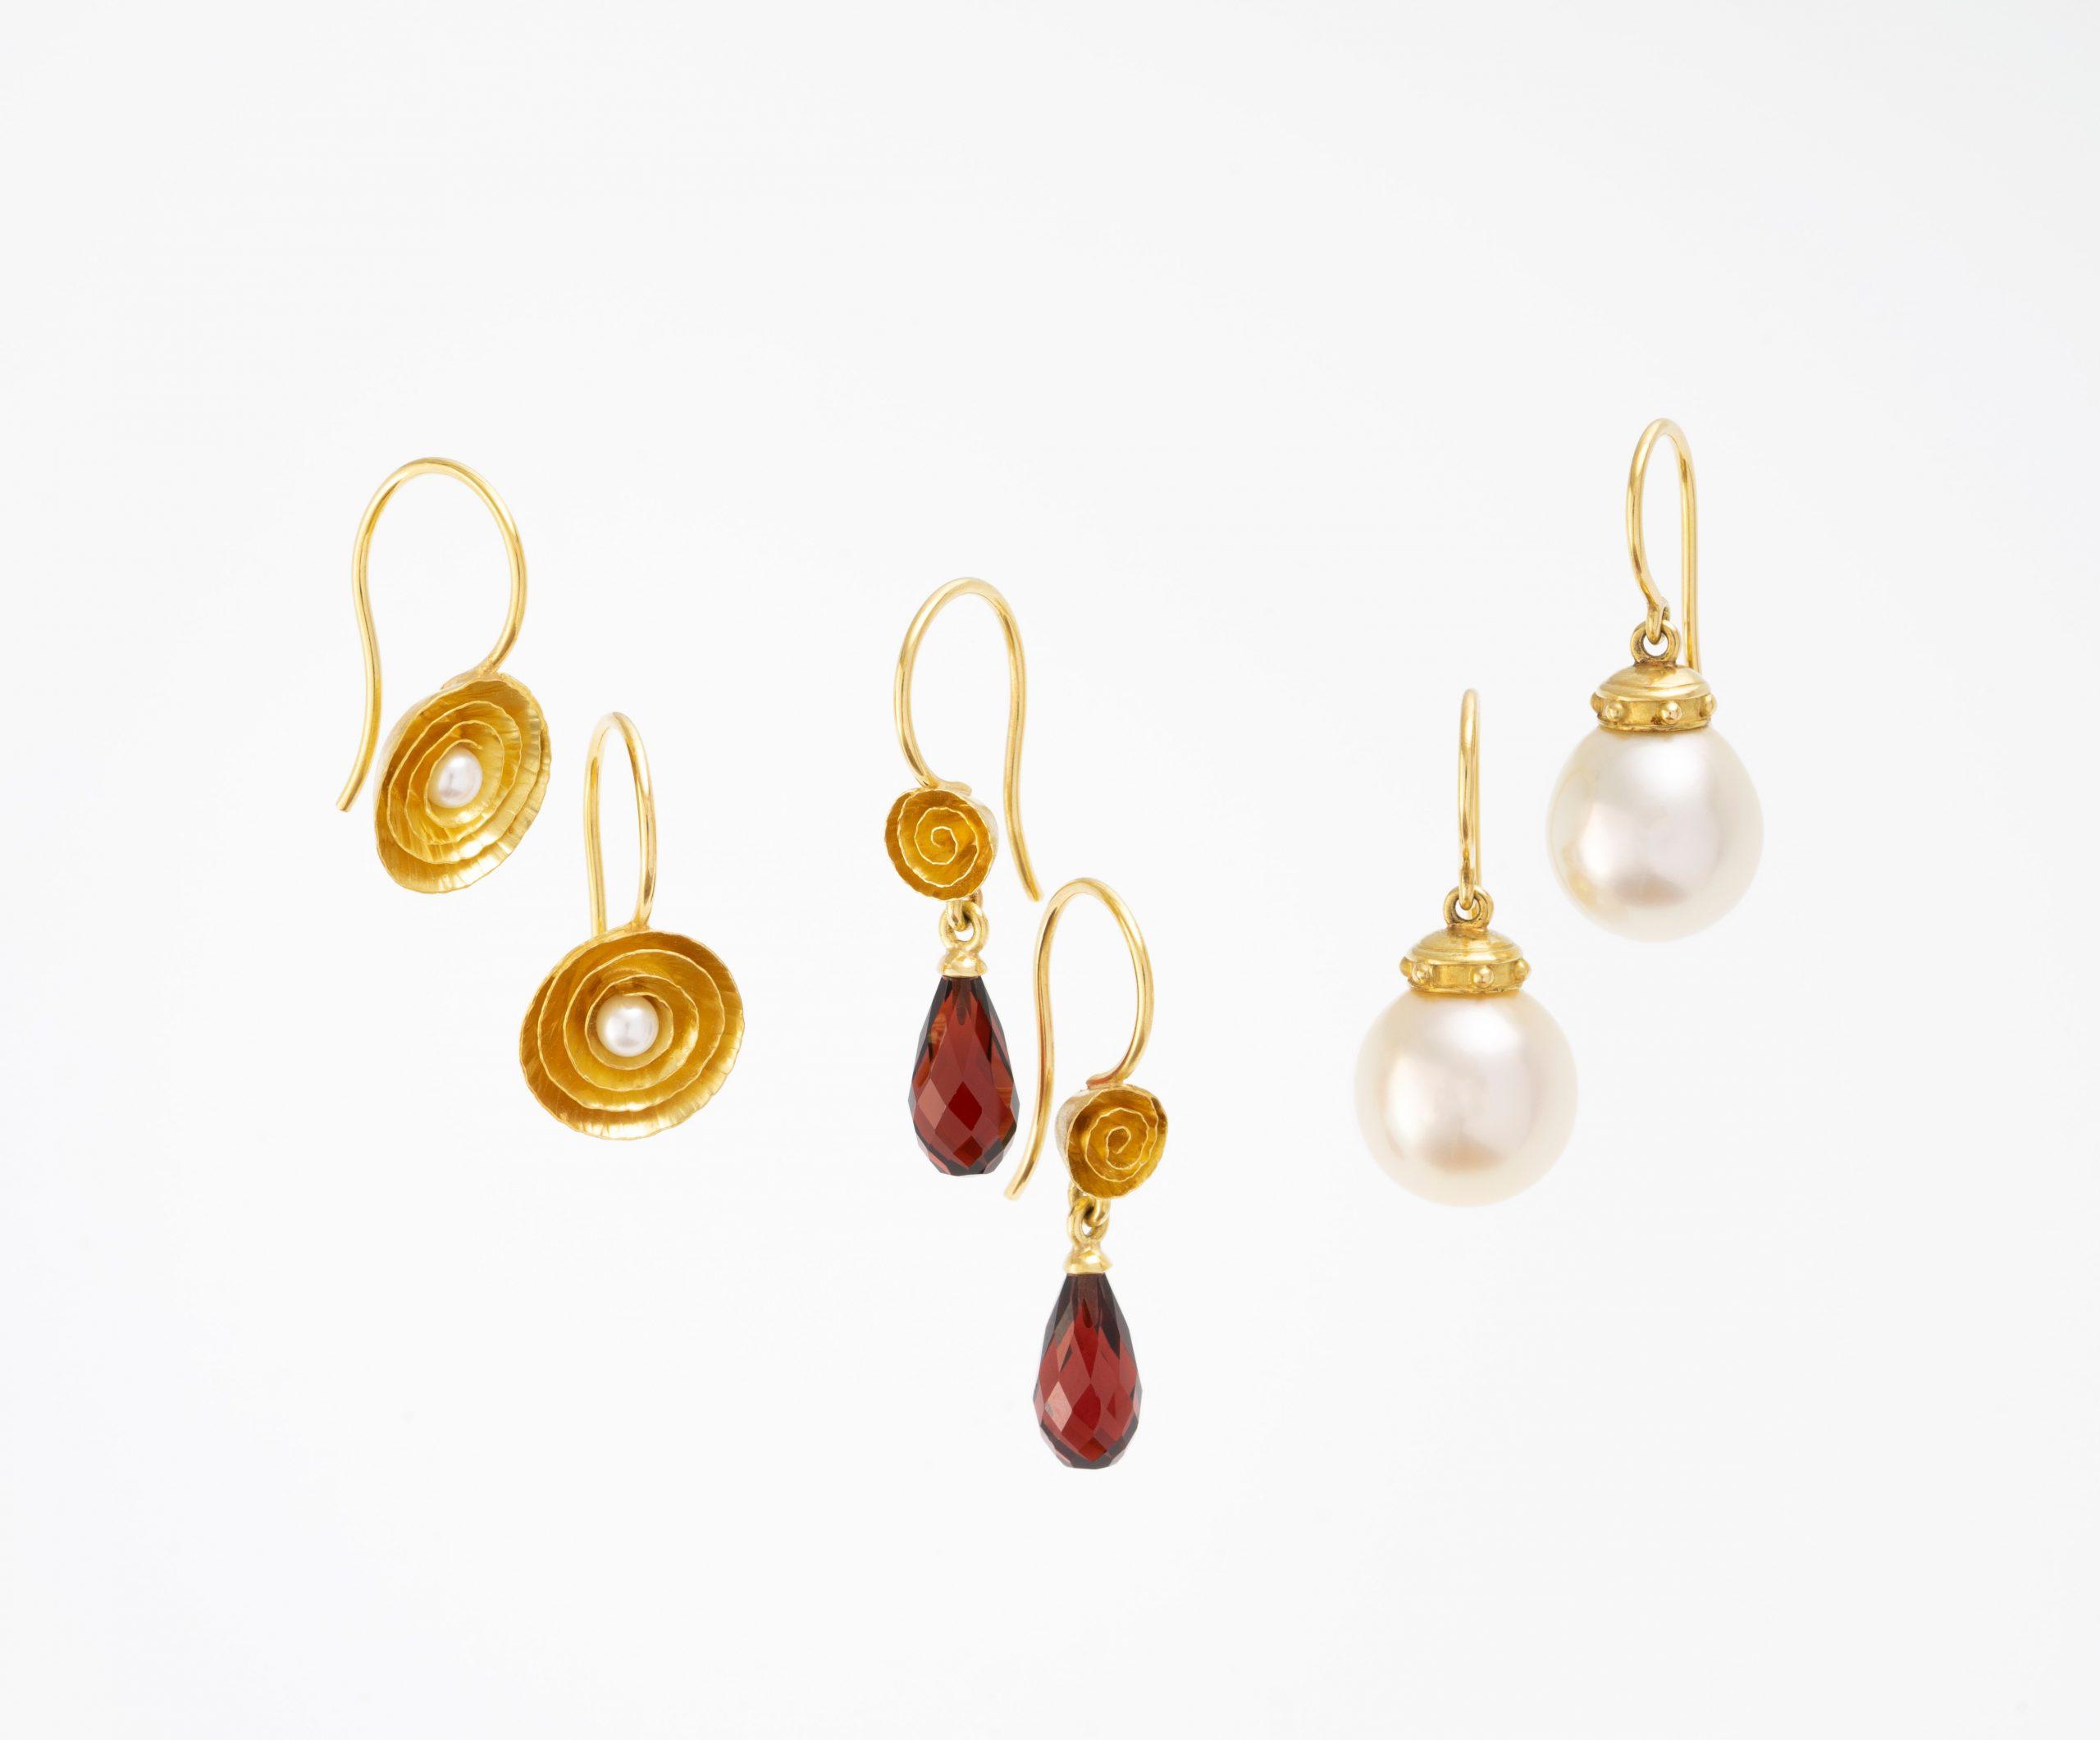 Ohrringe-Oexl-Perlen-Gold